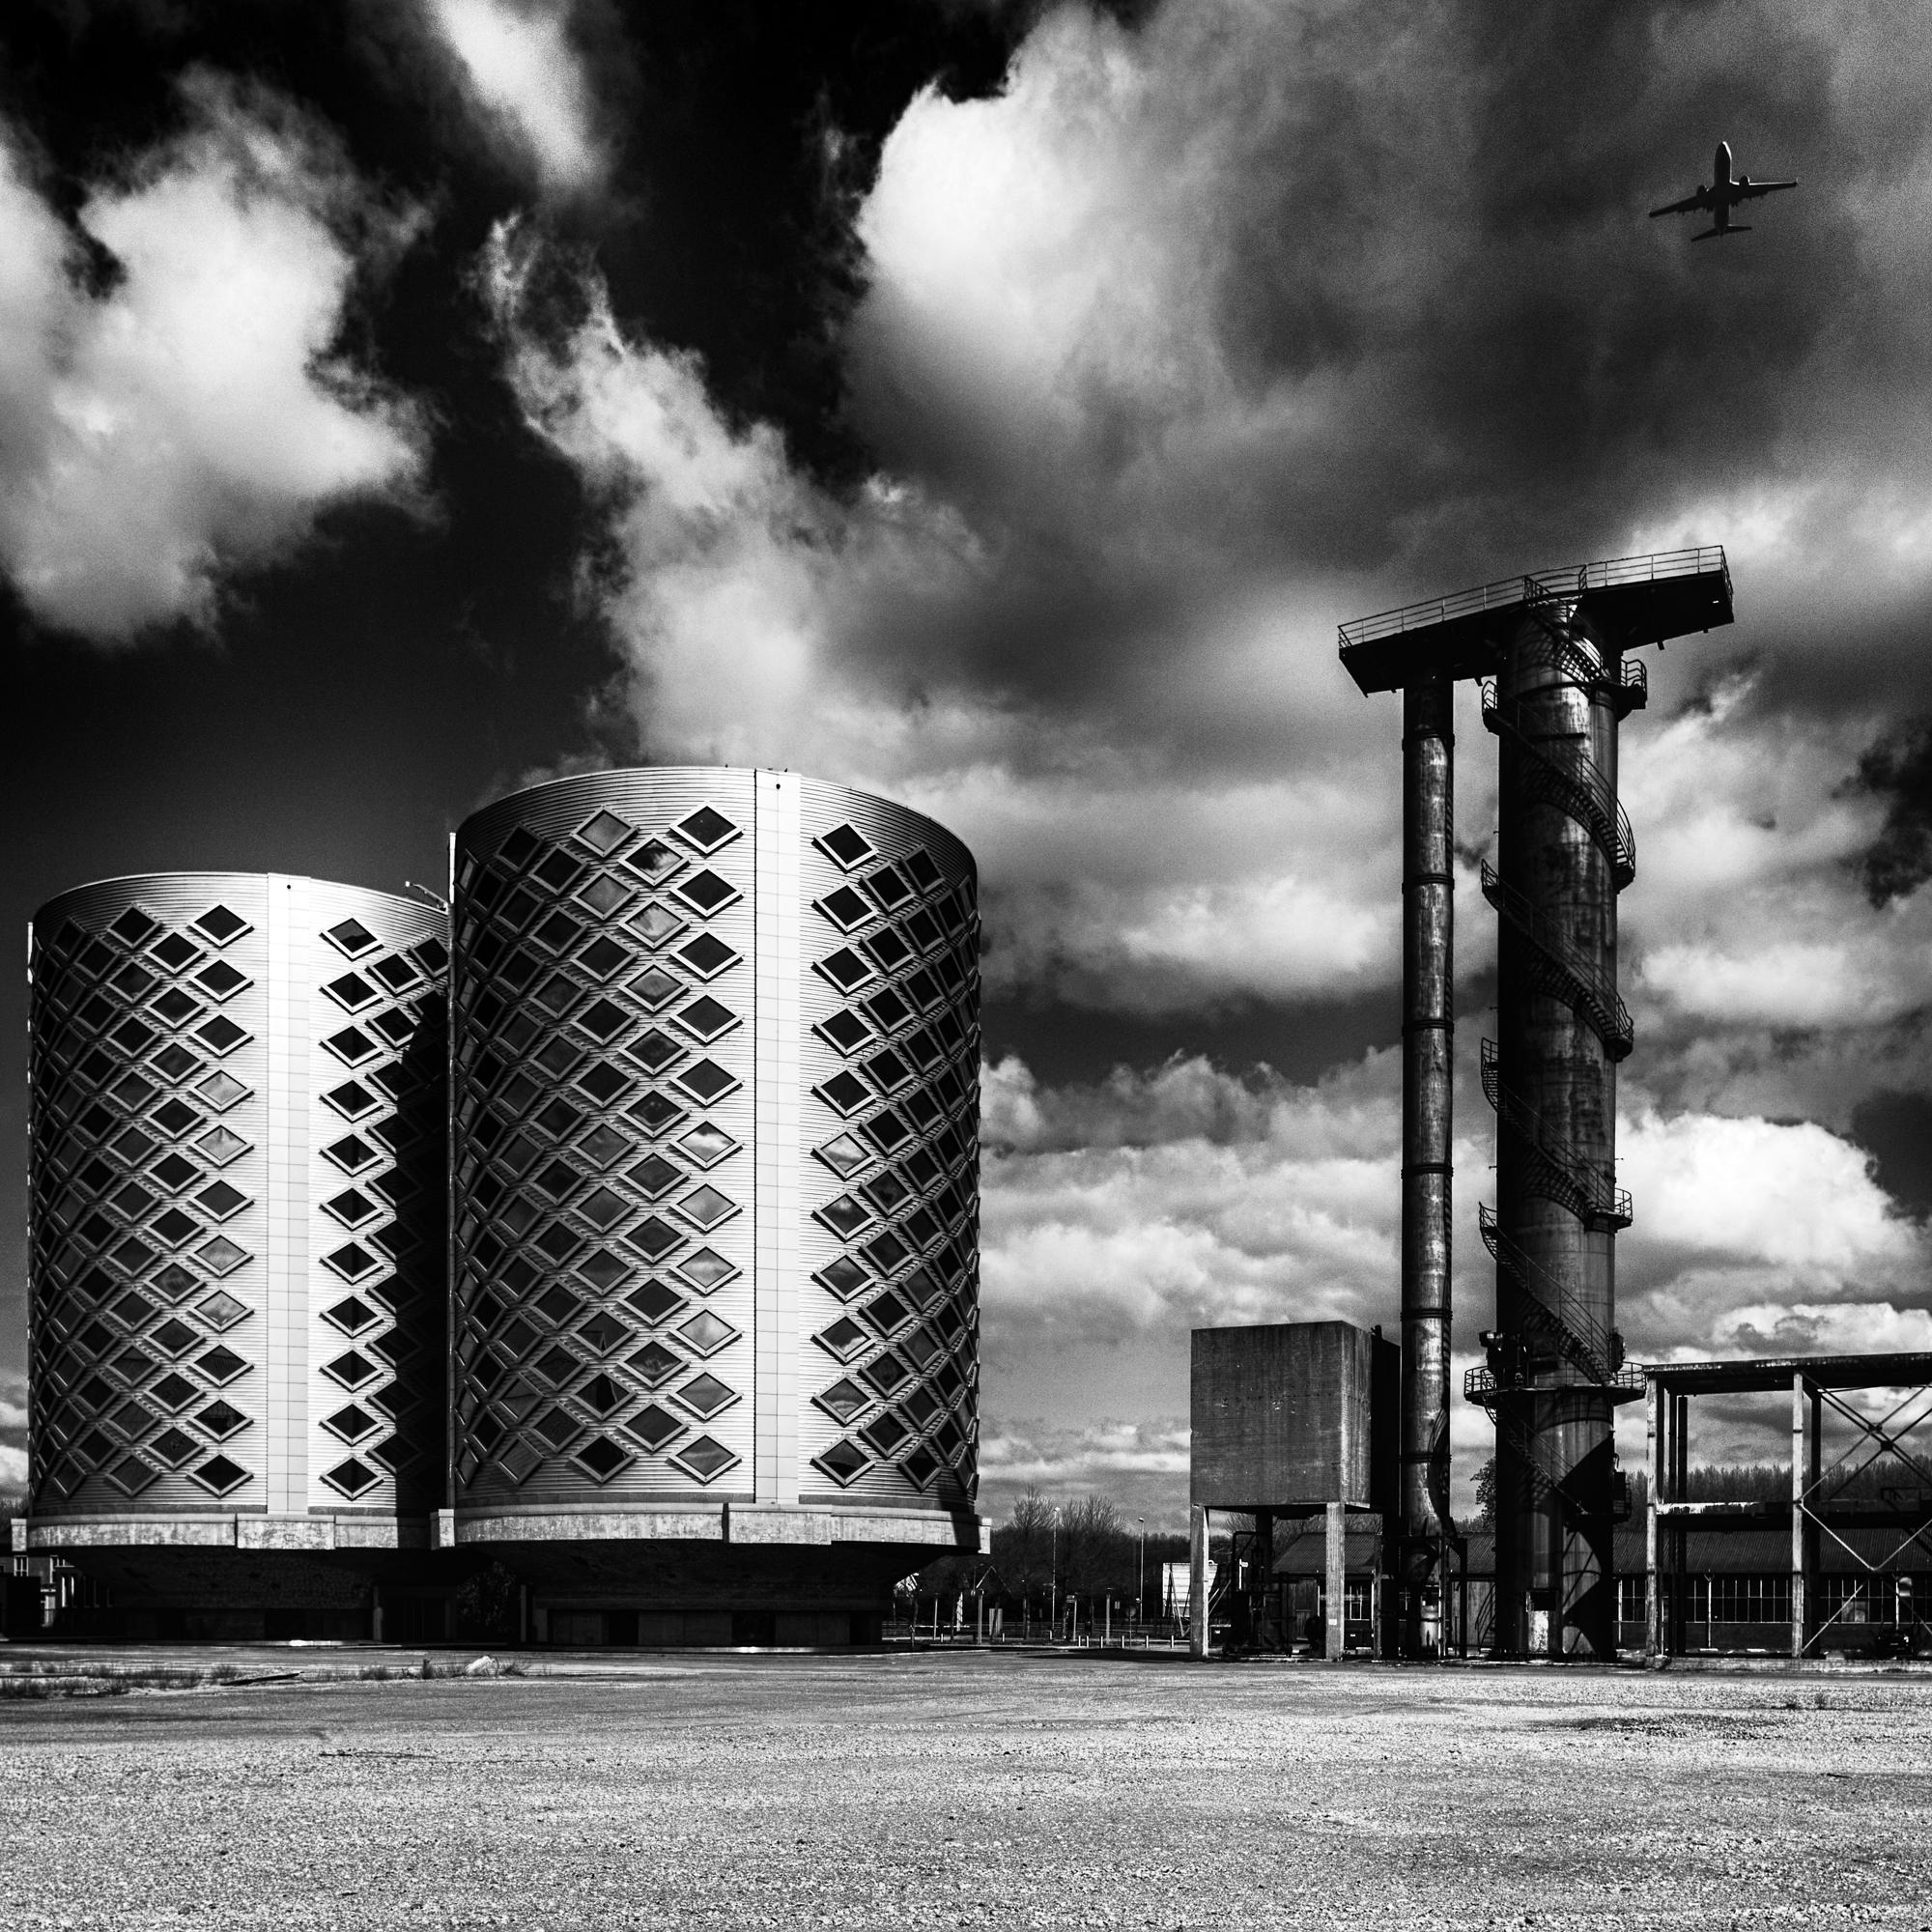 All rights reserved - Frank van Haalen